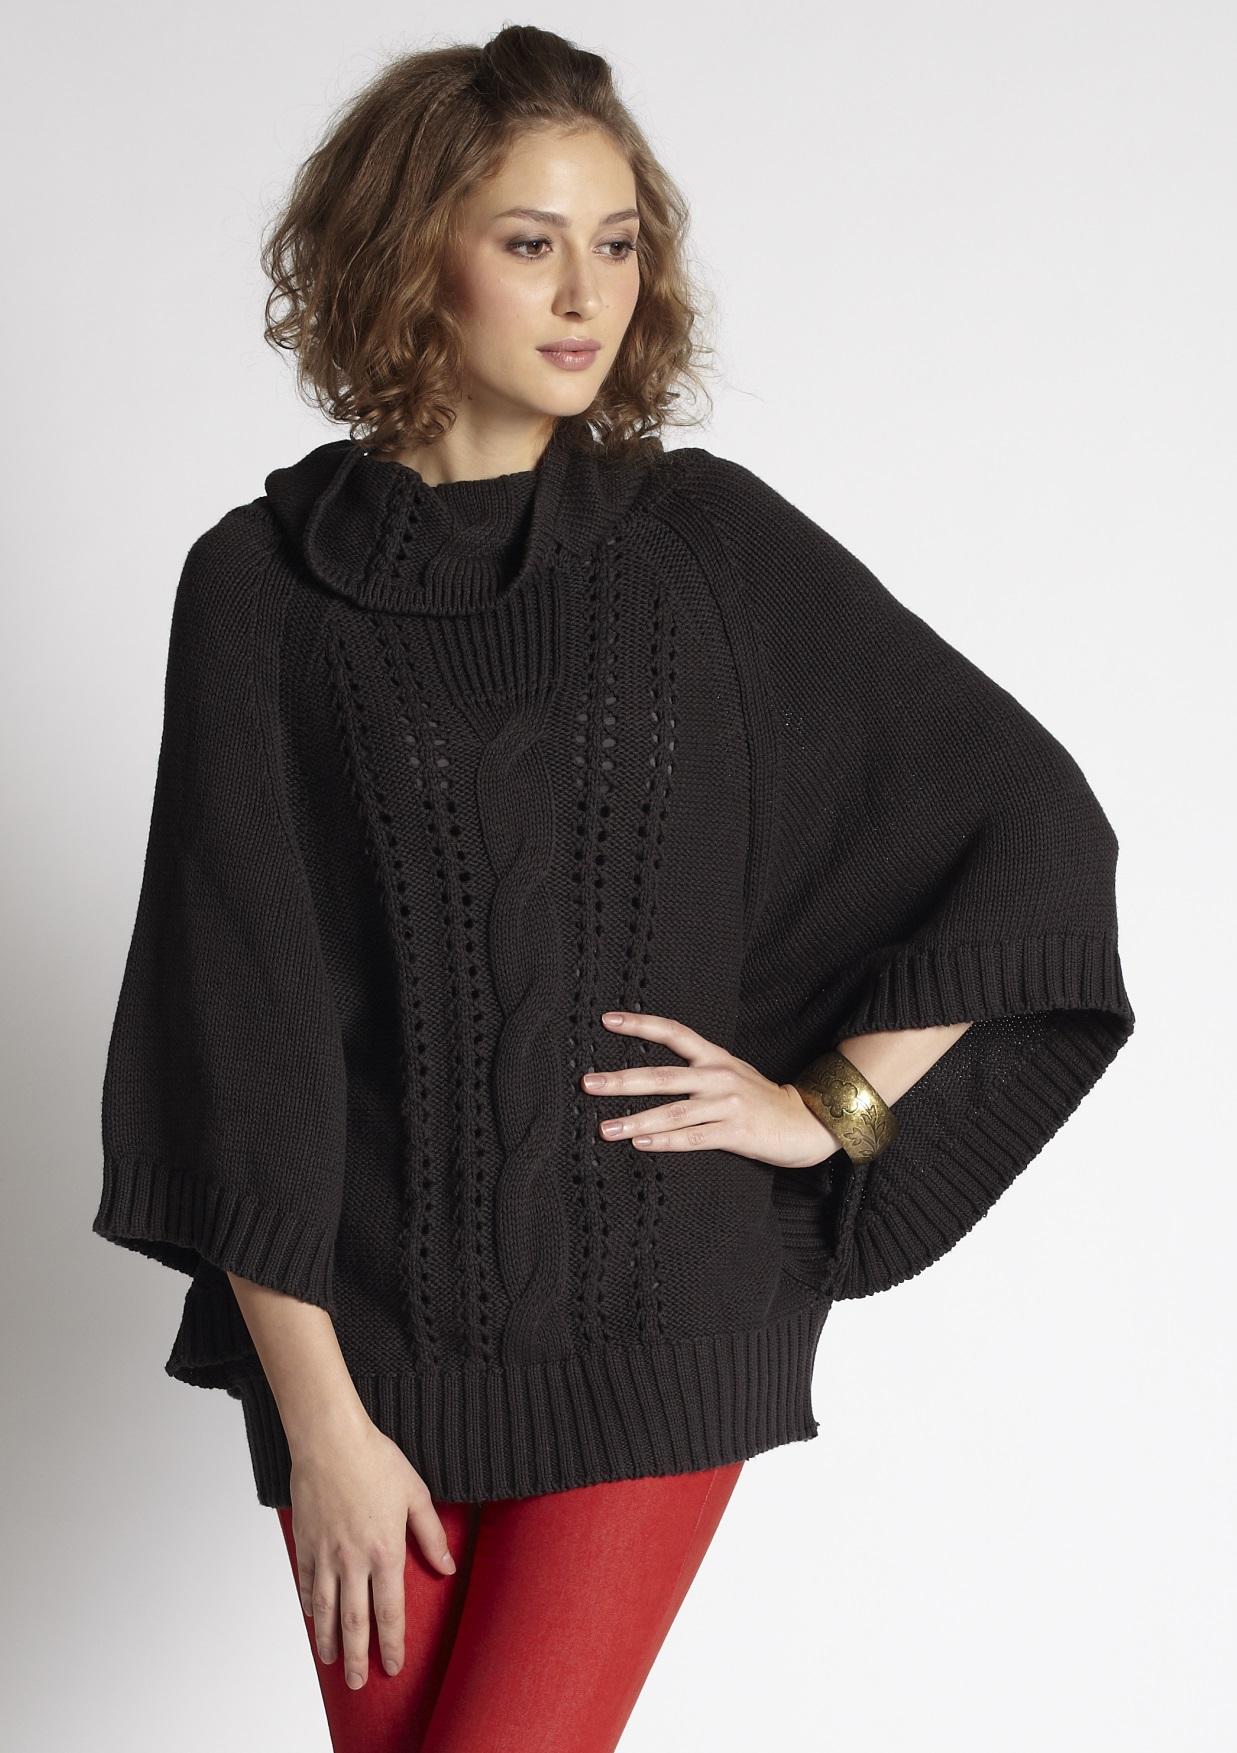 mothers-en-vogue-cable-knit-nursing-poncho-sweater-dark-grey.jpg